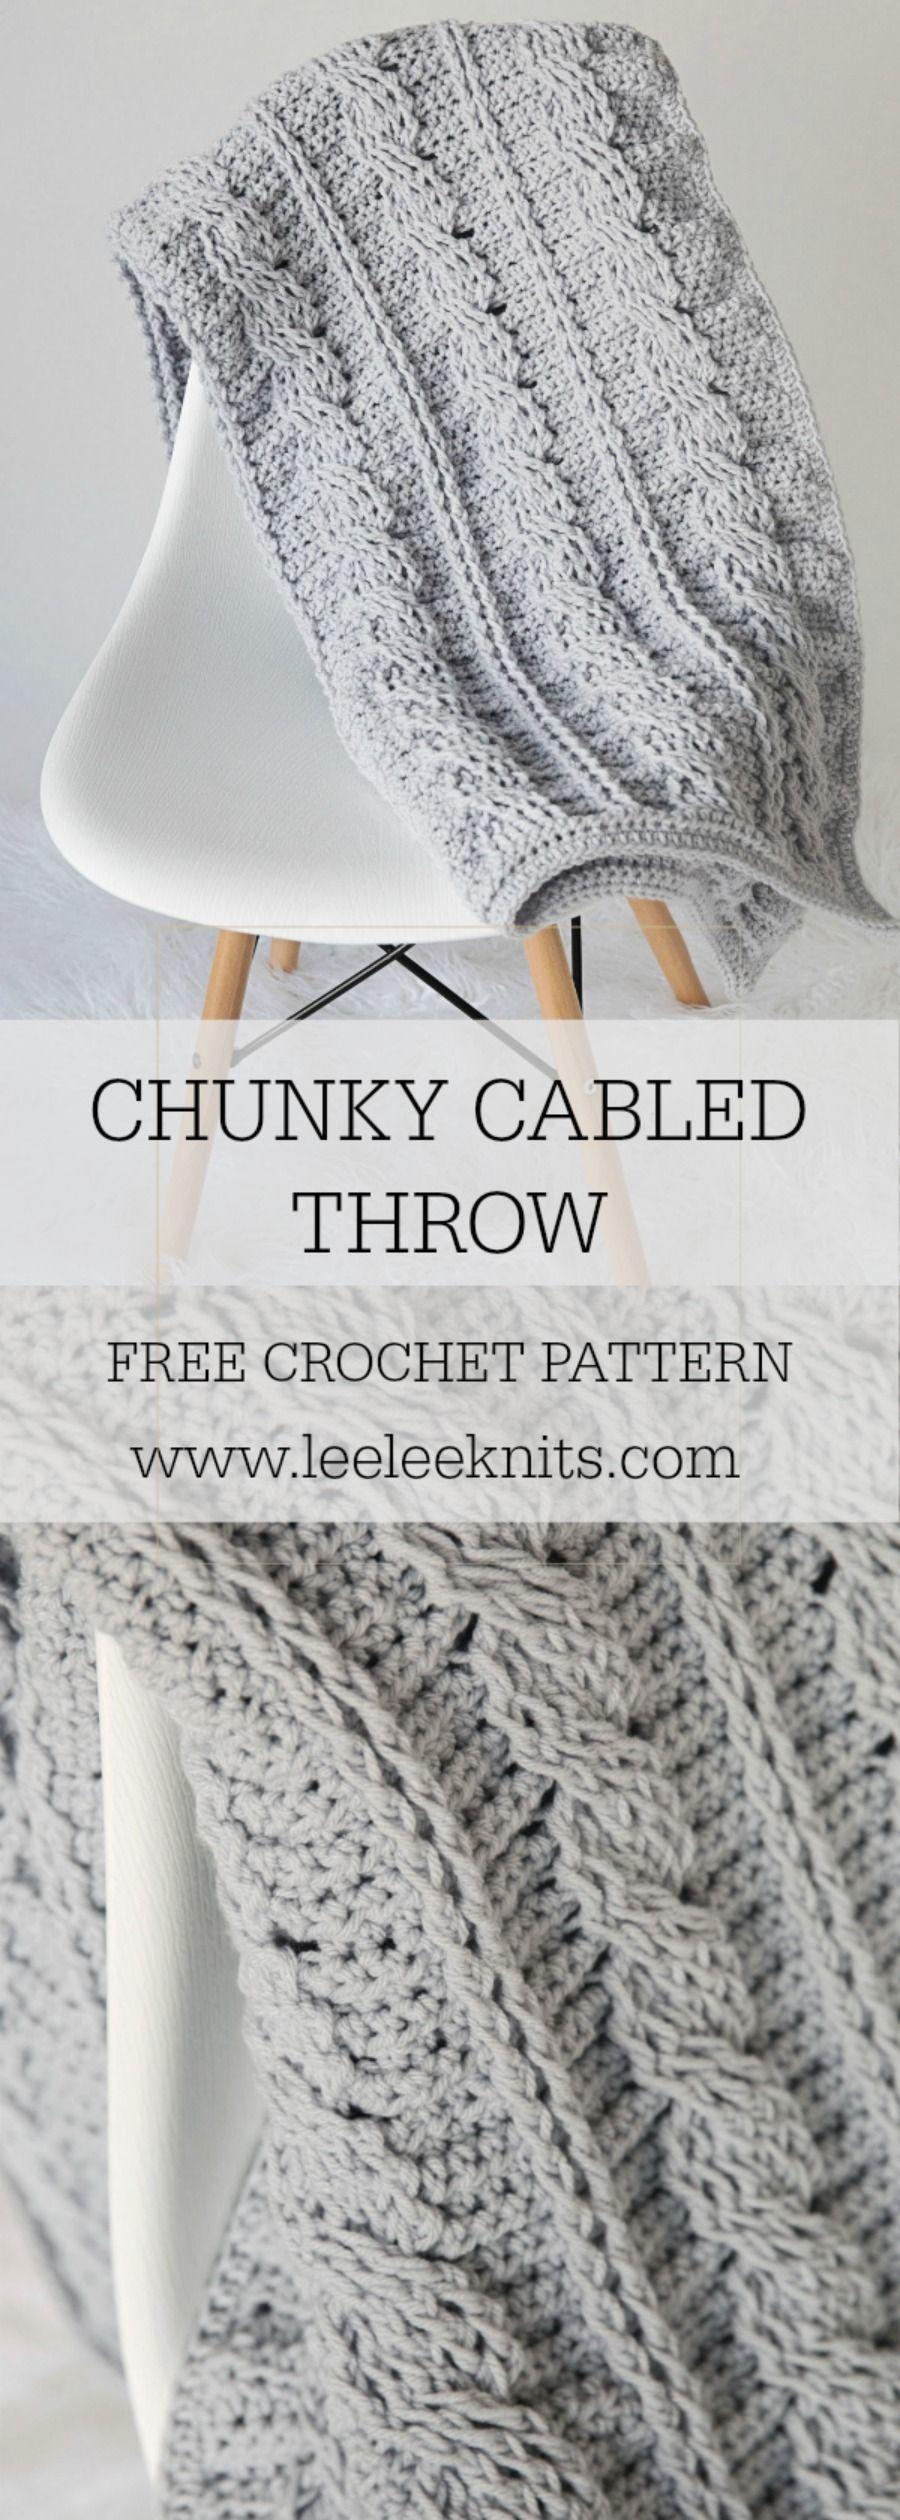 Timeless Cabled Throw Crochet Pattern | Crochet Crazy | Pinterest ...